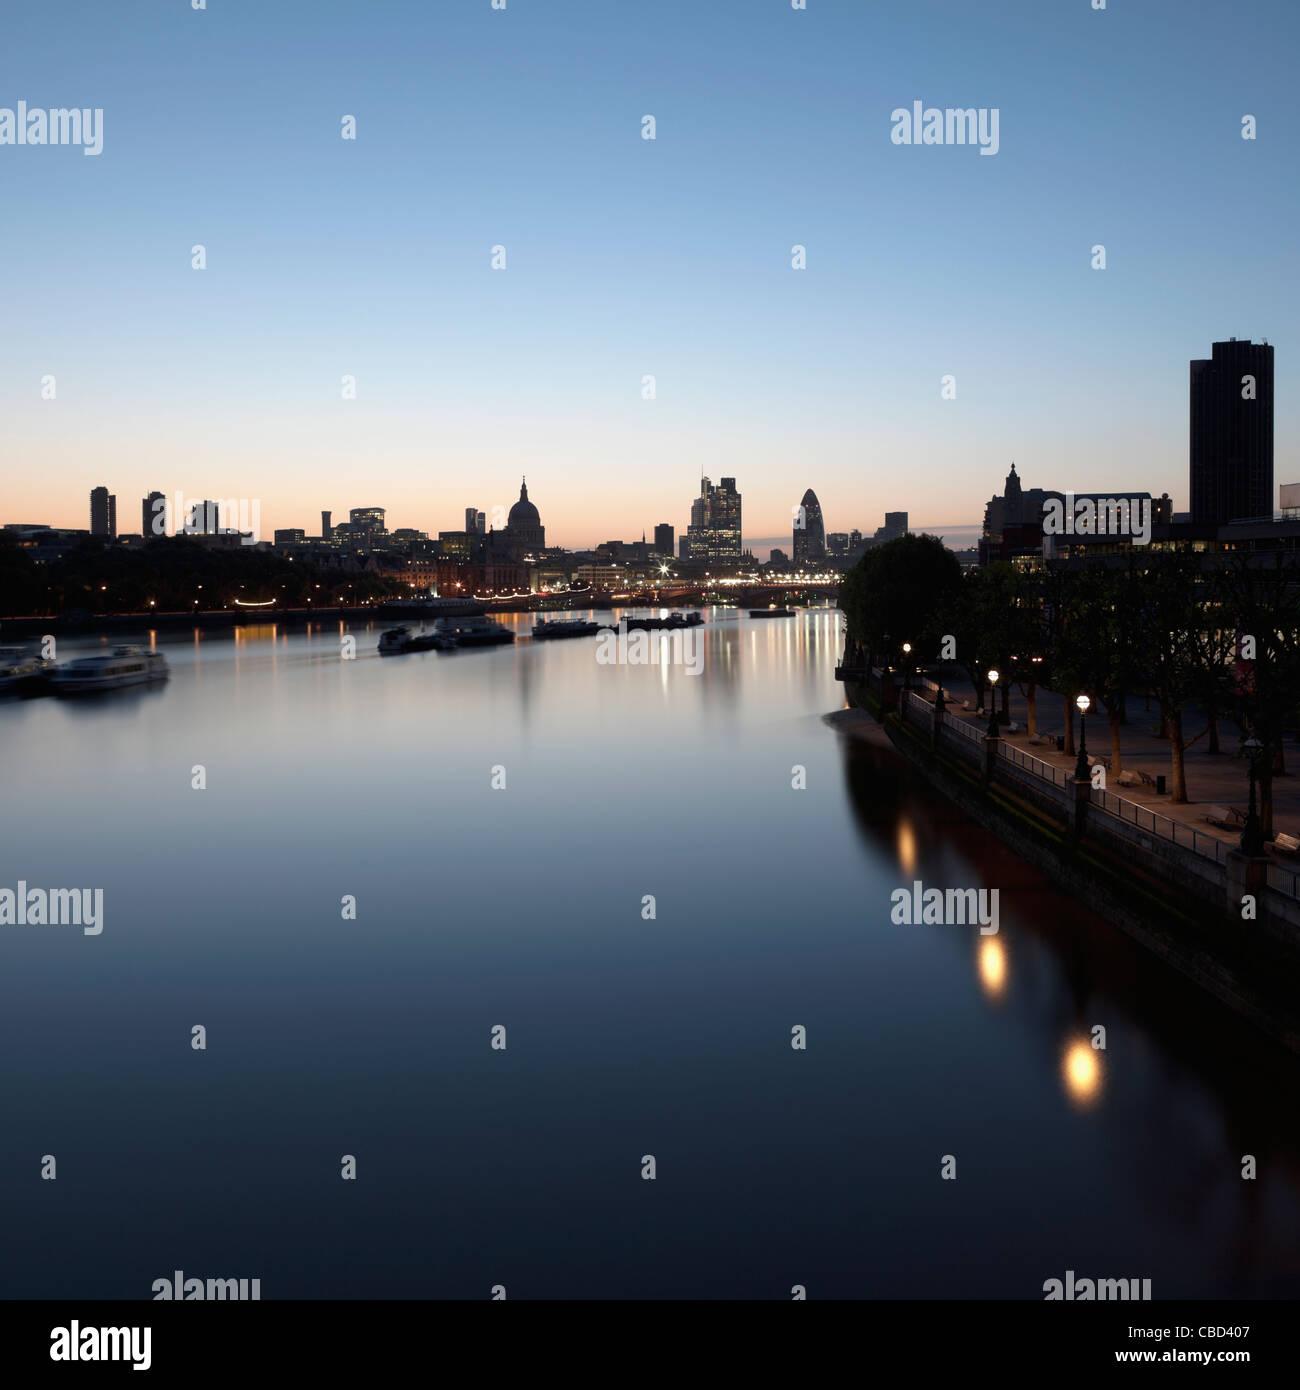 River running through city center - Stock Image